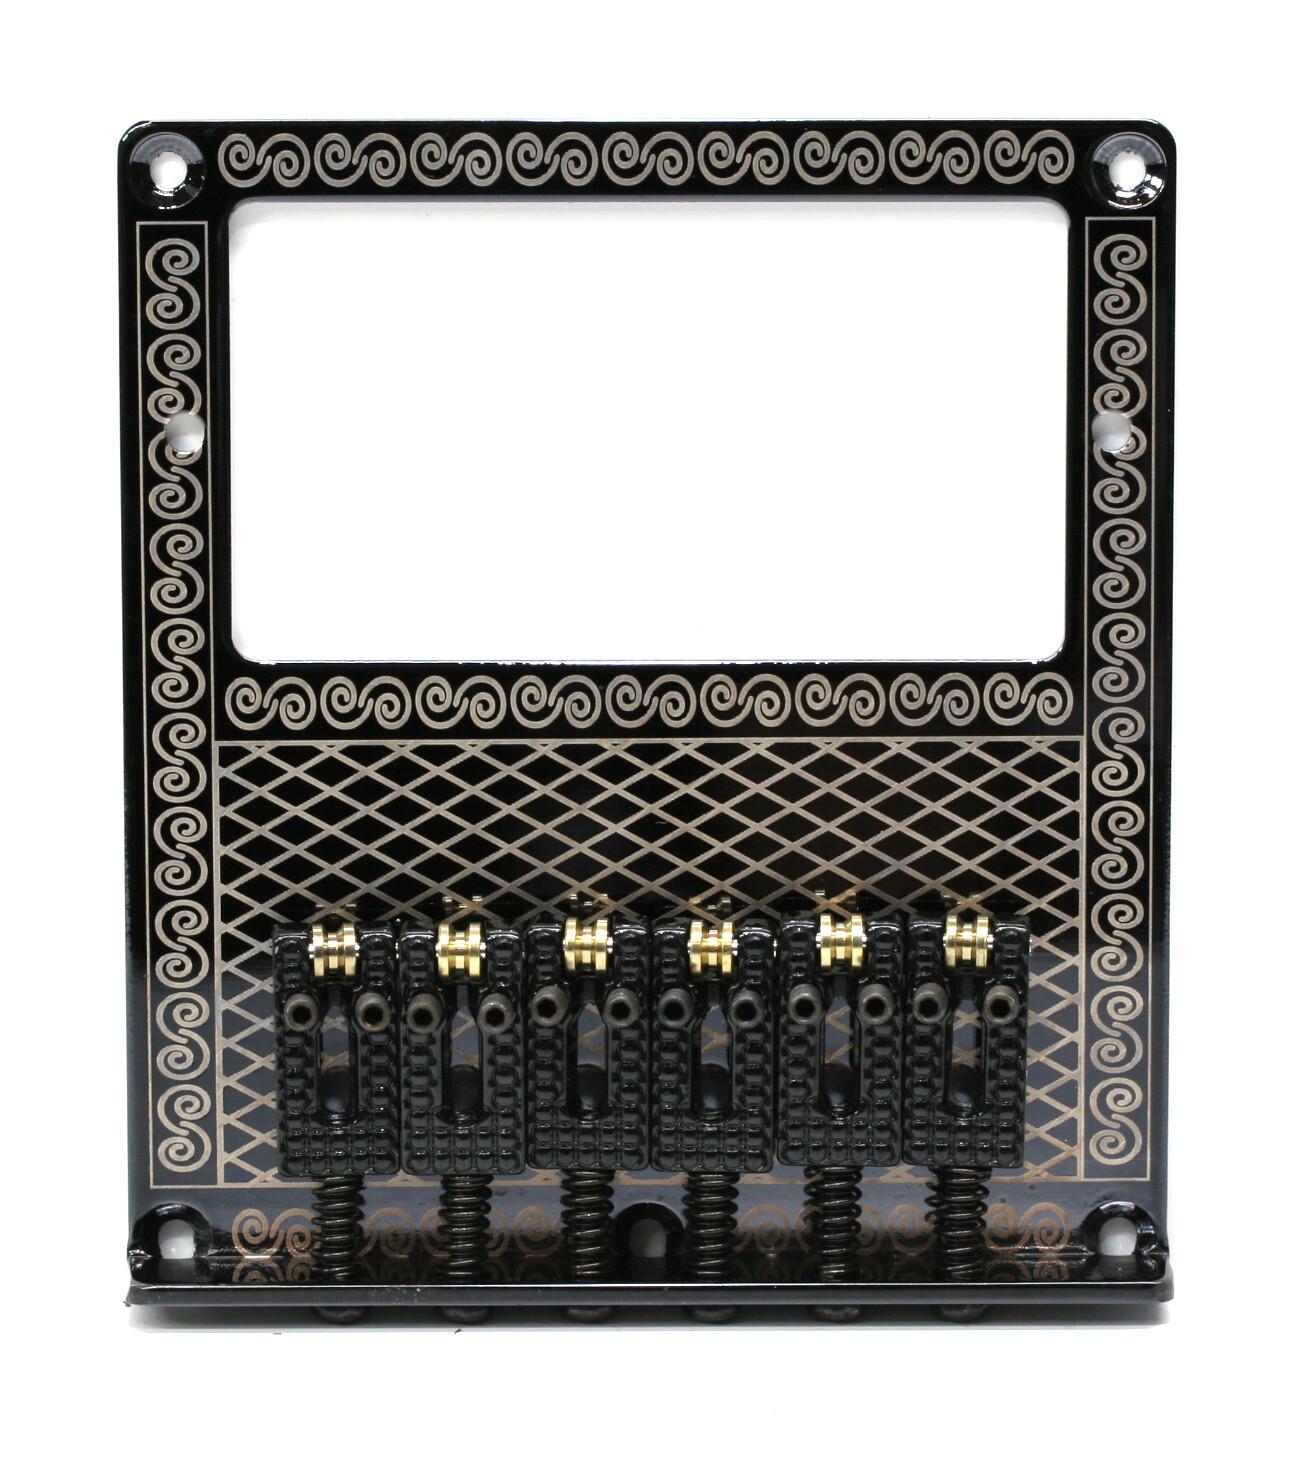 Brio 6 Saddles Humbucker Telecaster Bridge Plate Design Gold on Black